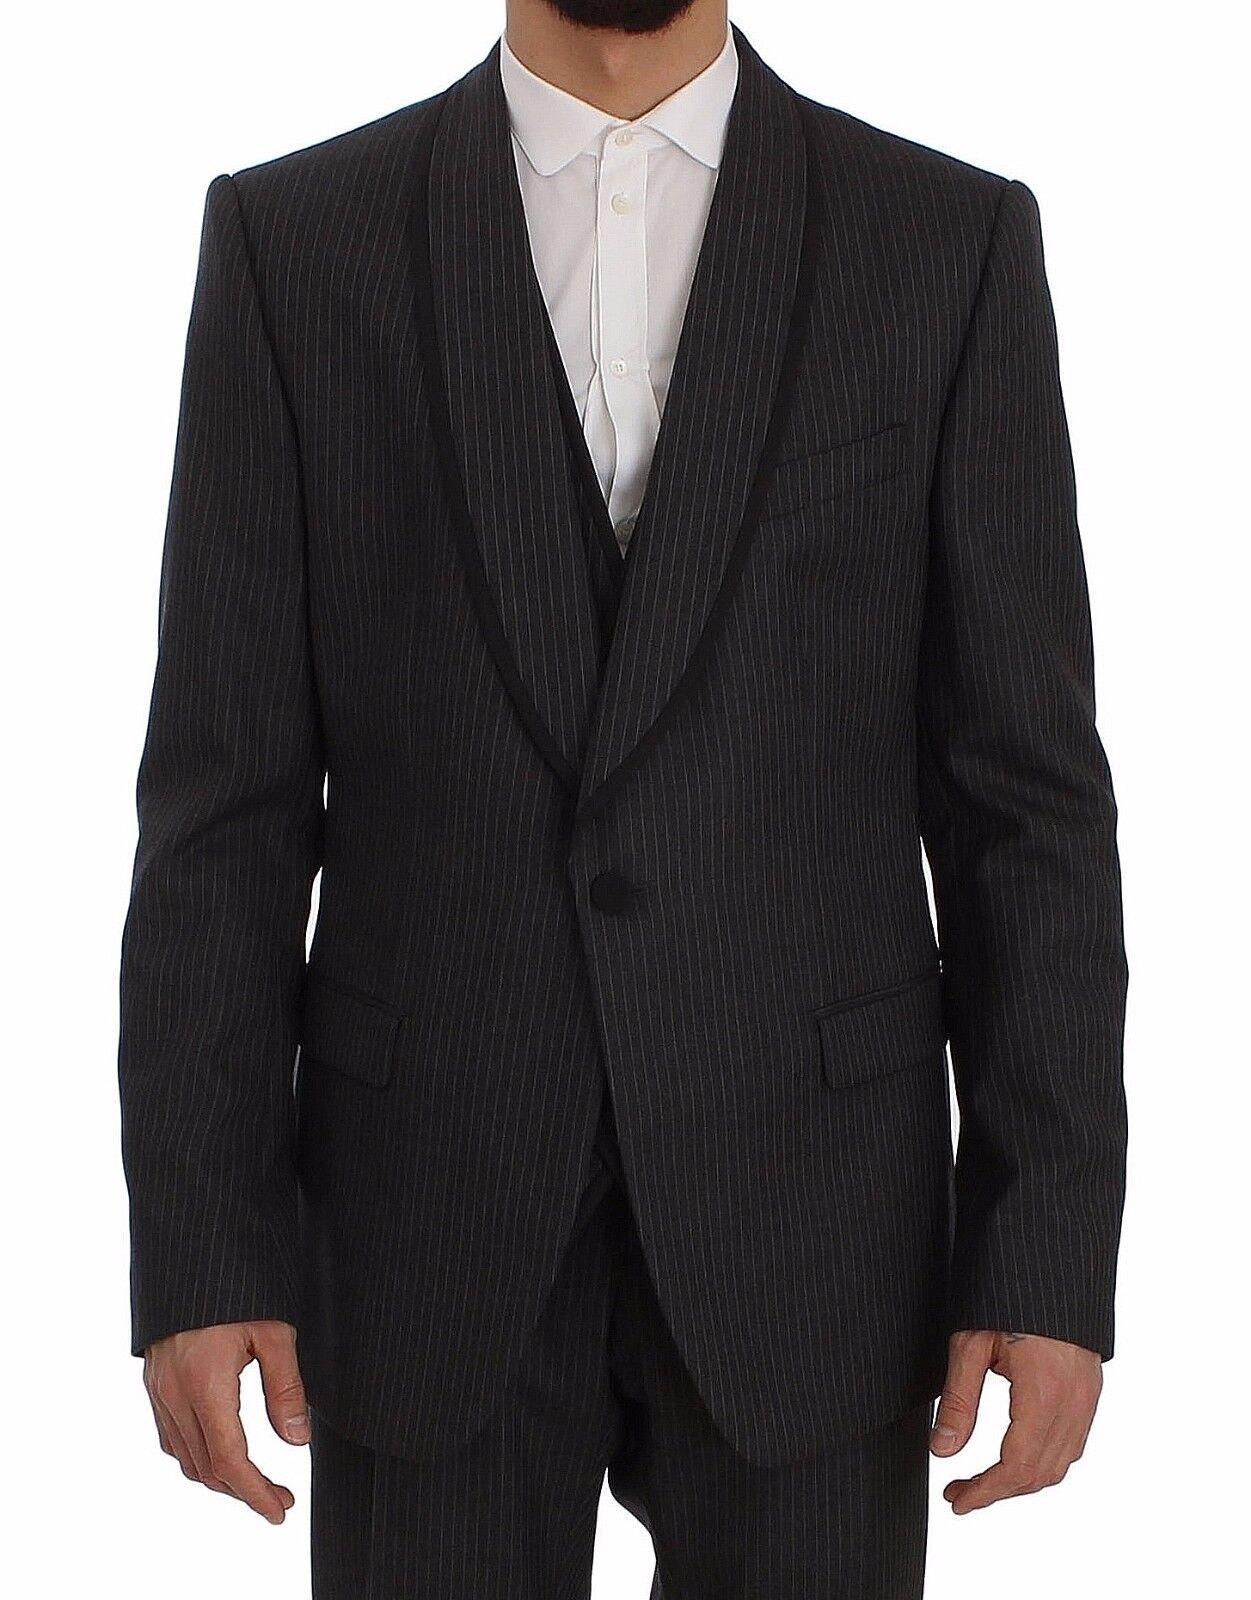 NEW DOLCE & GABBANA Suit 3 Piece grau Striped Wool Slim Fit EU54 / US44/XL